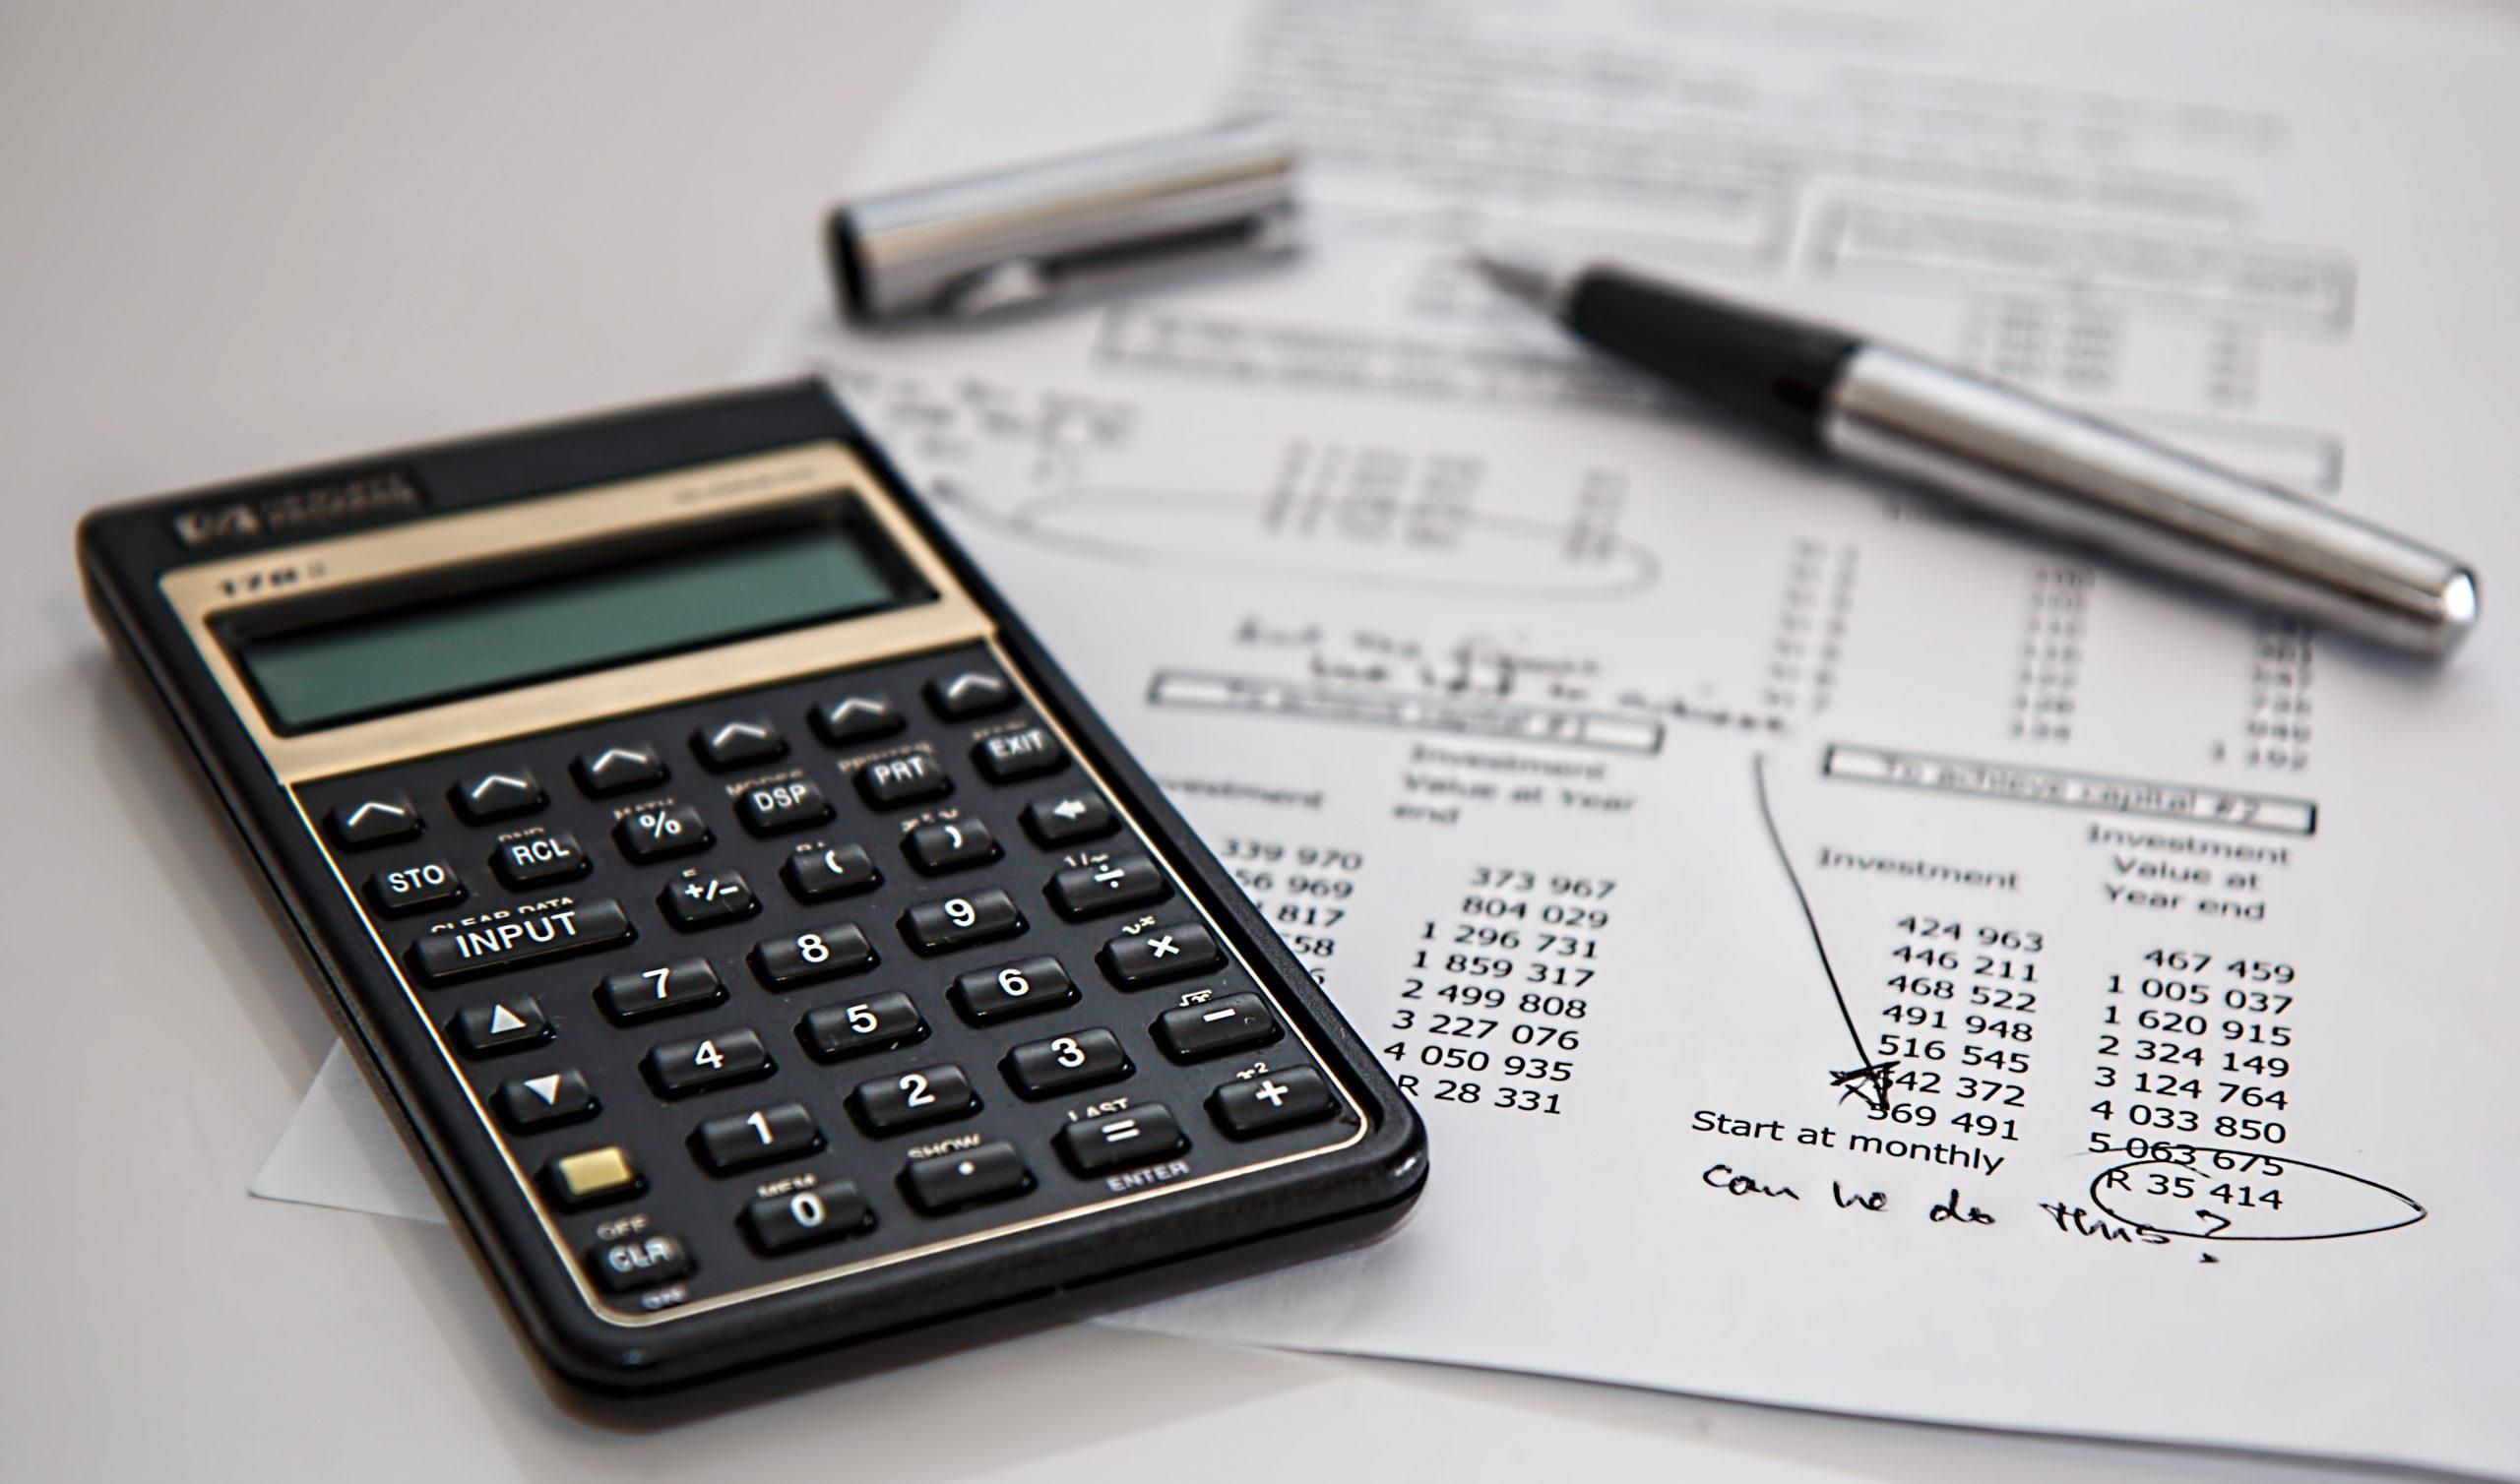 calculator, pen and accounting sheets